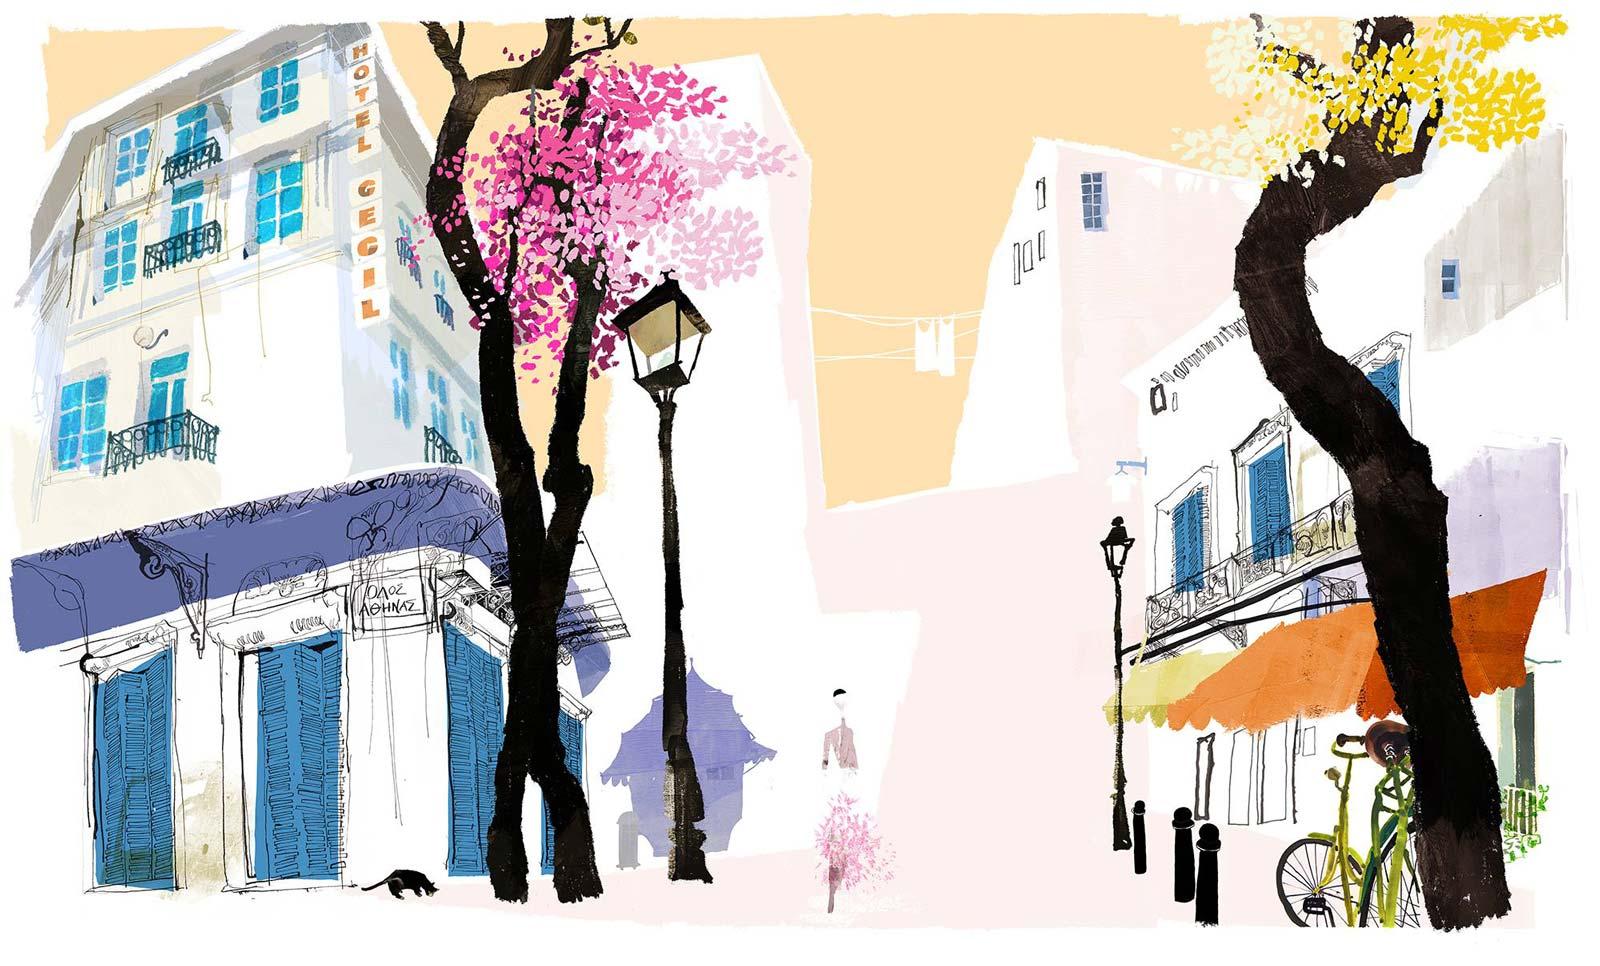 Daniel Egnéus' drawings of an everyday walk in Athens